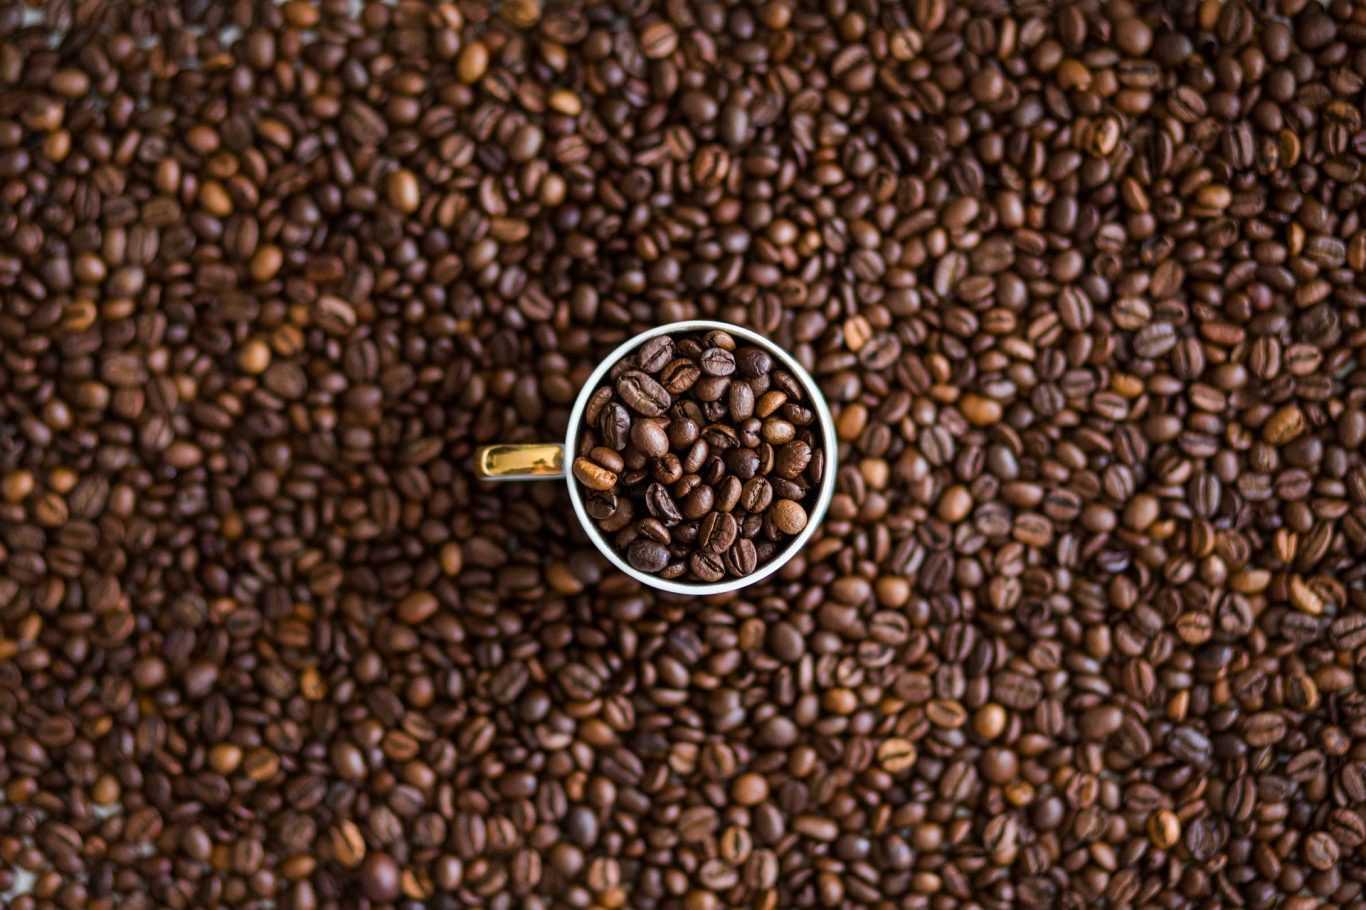 kawy-mielone-ziarniste-palone-cafe-creator-sklep-producent-20